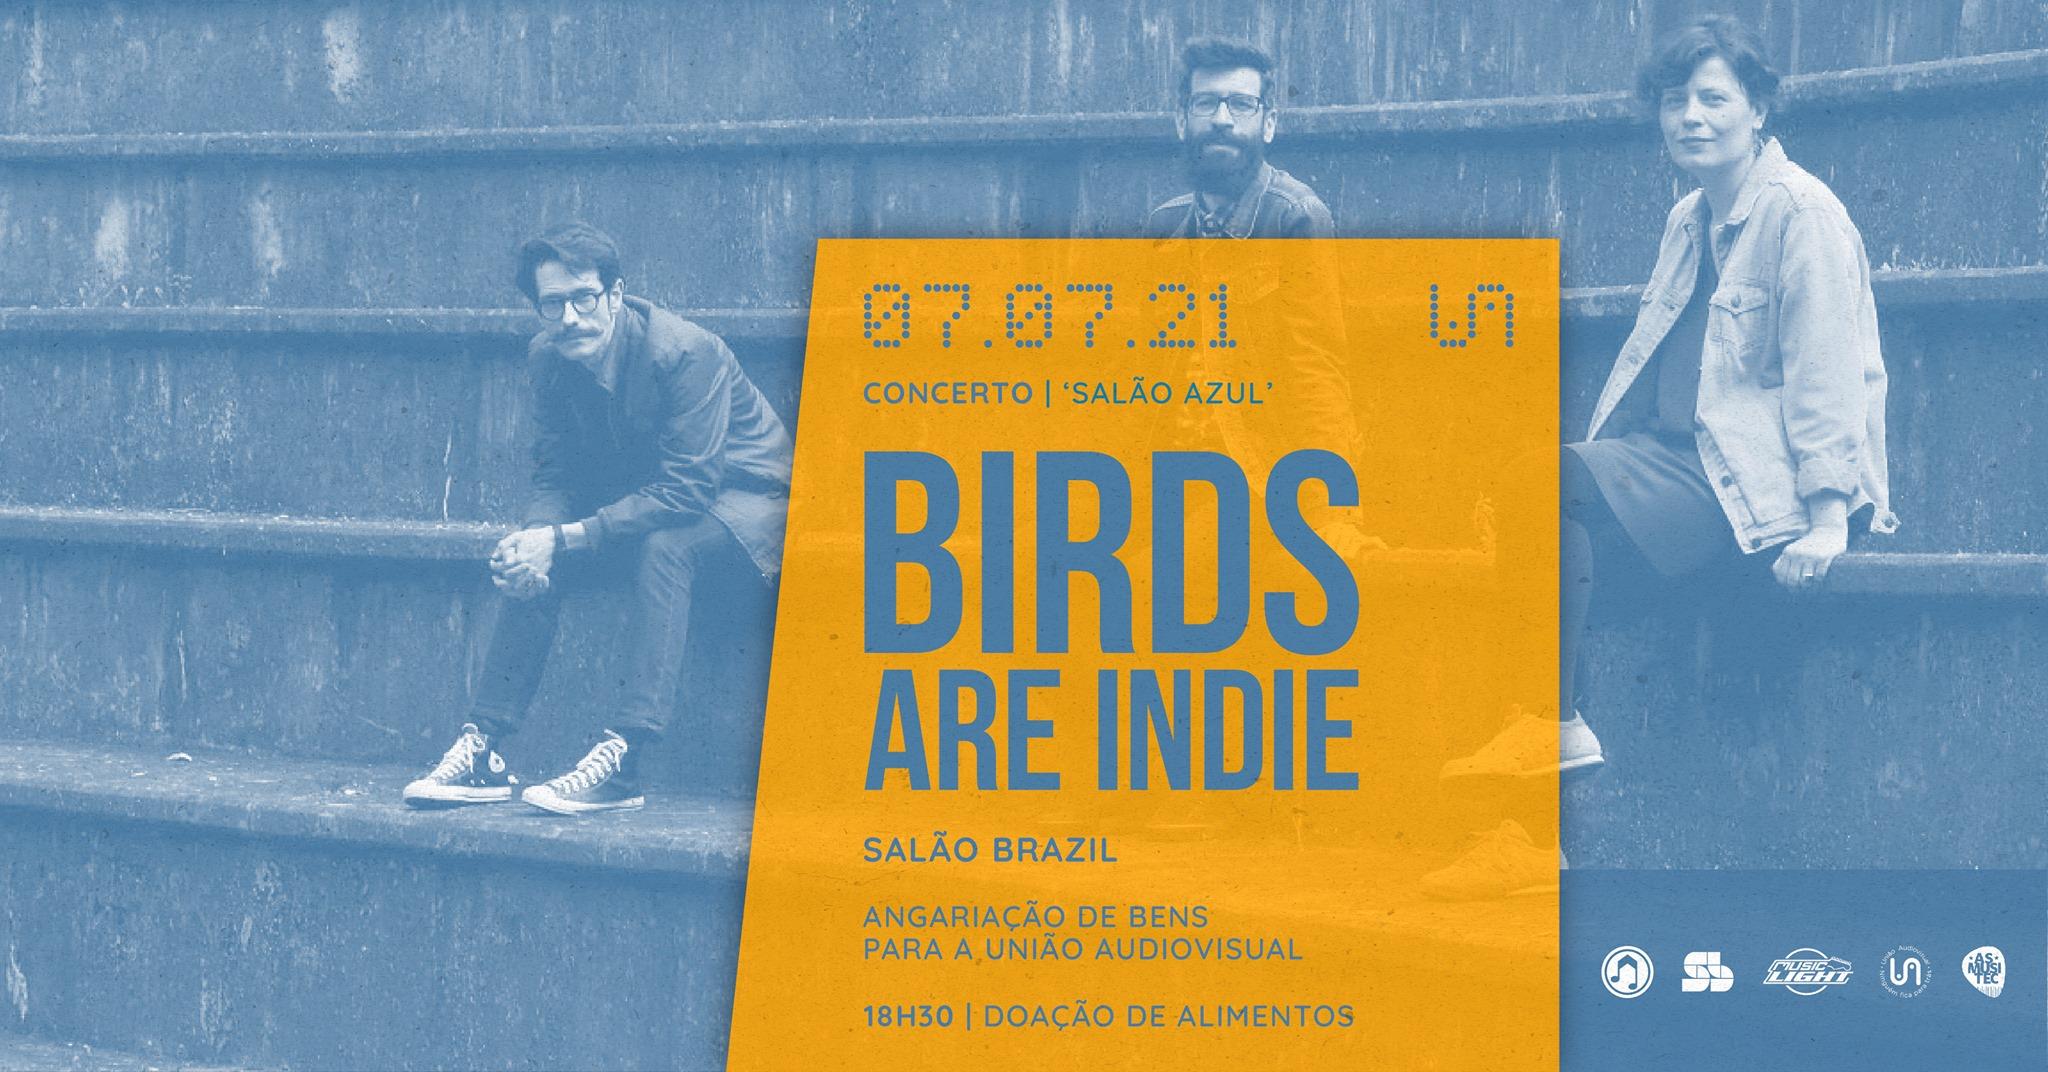 Salão Azul ~ Birds Are Indie